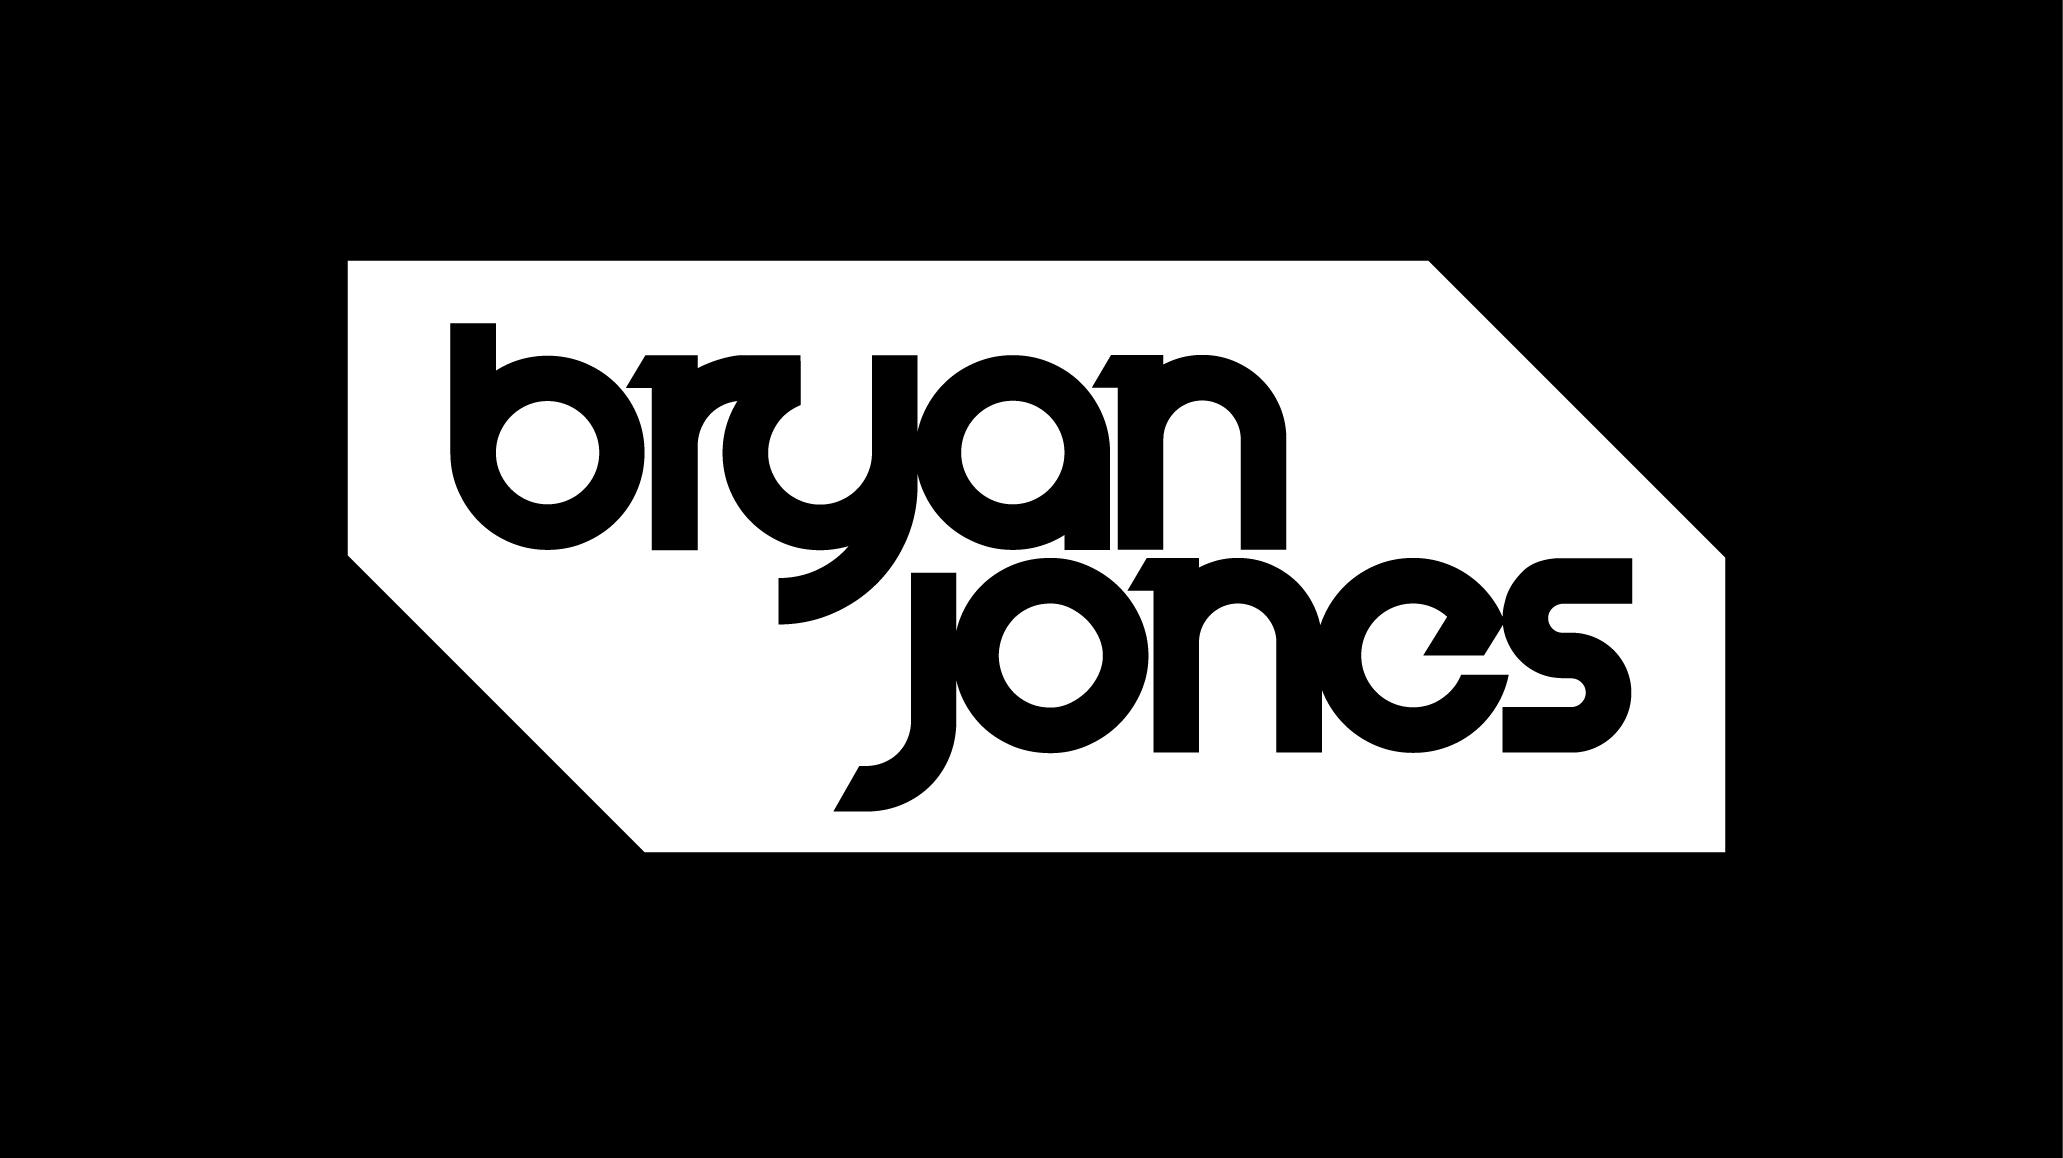 Bryan Jones